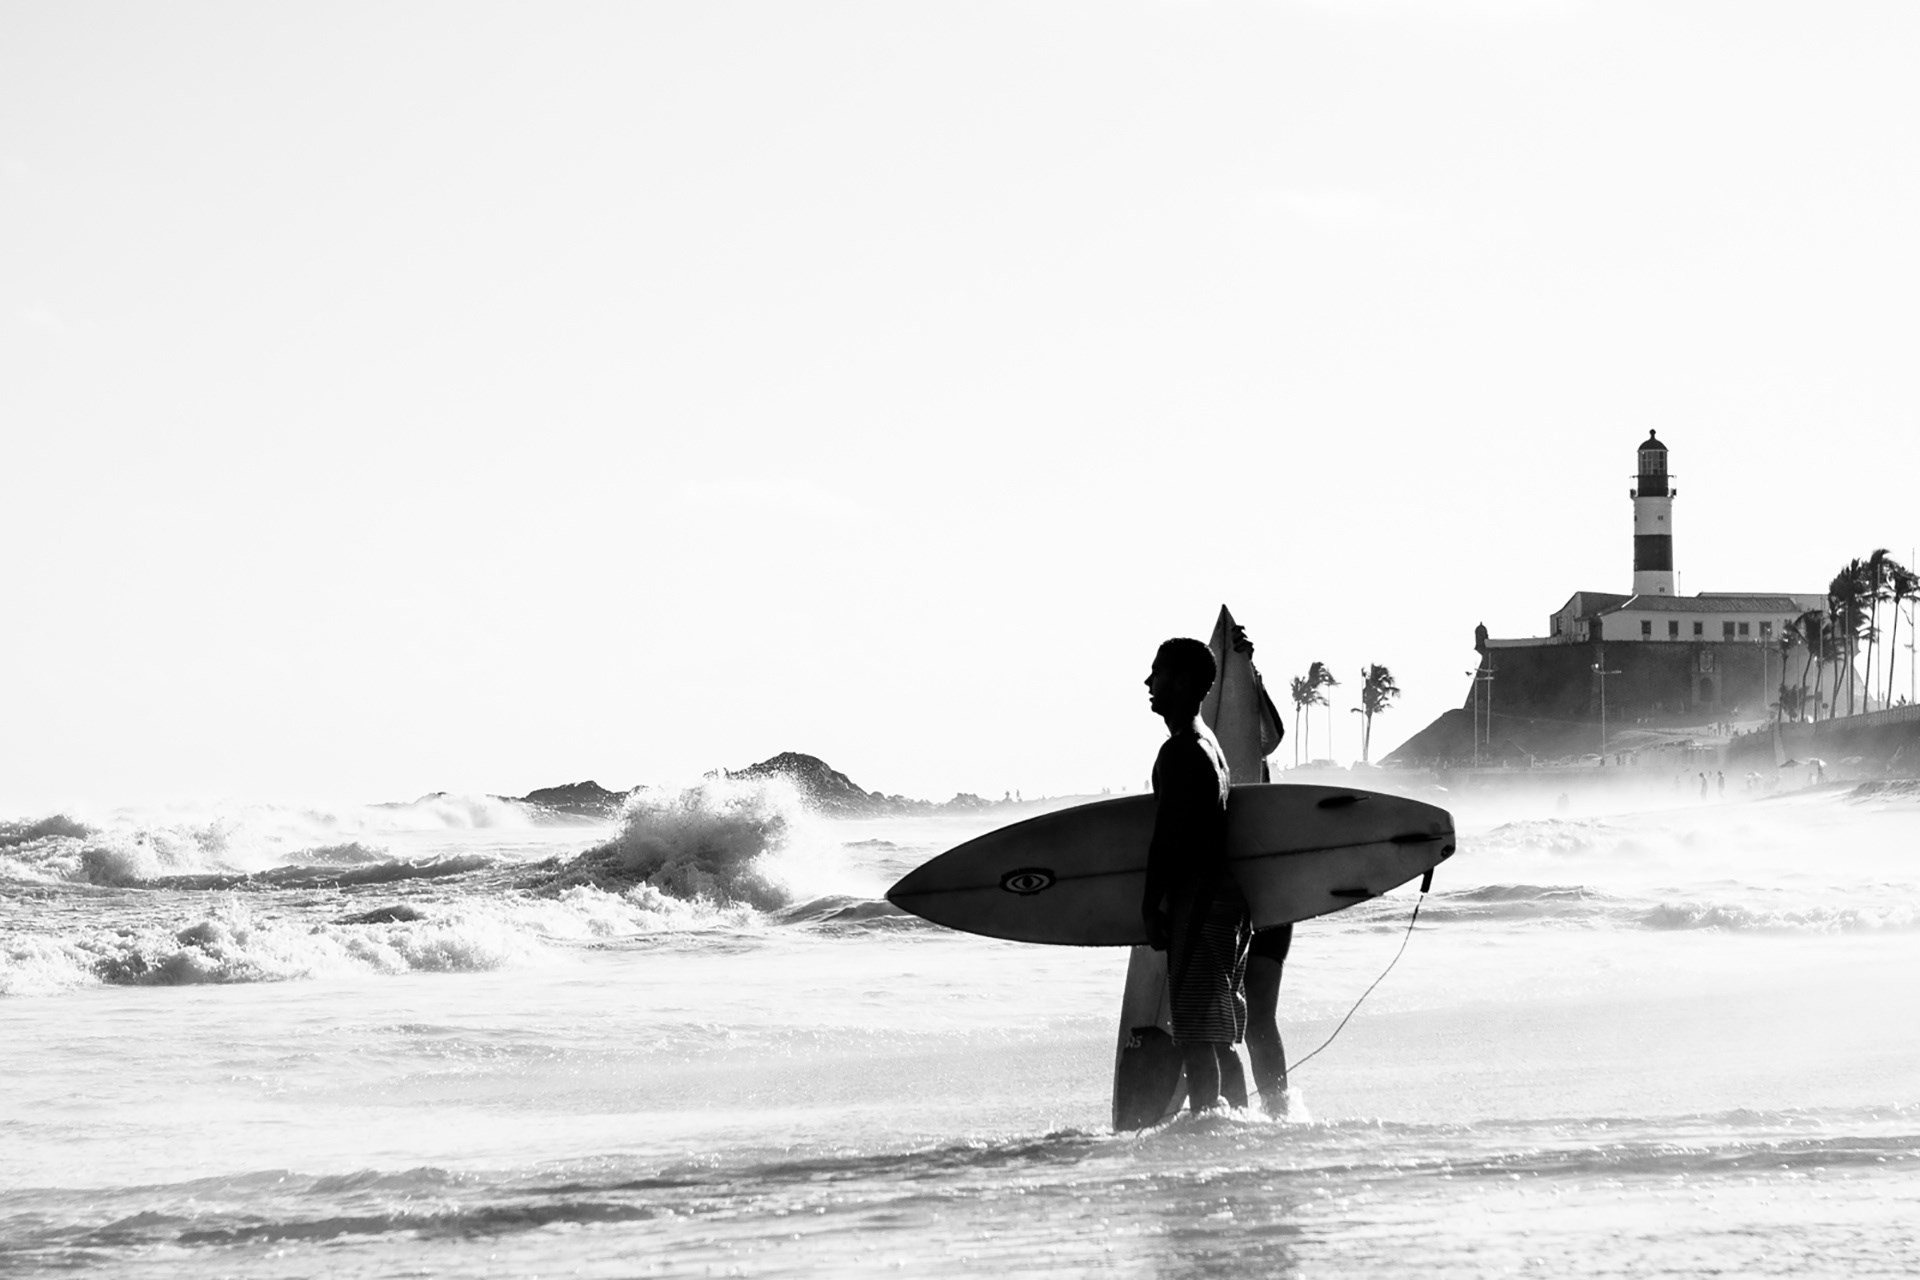 Free screensaver surfing image, 220 kB – Aspen Grant